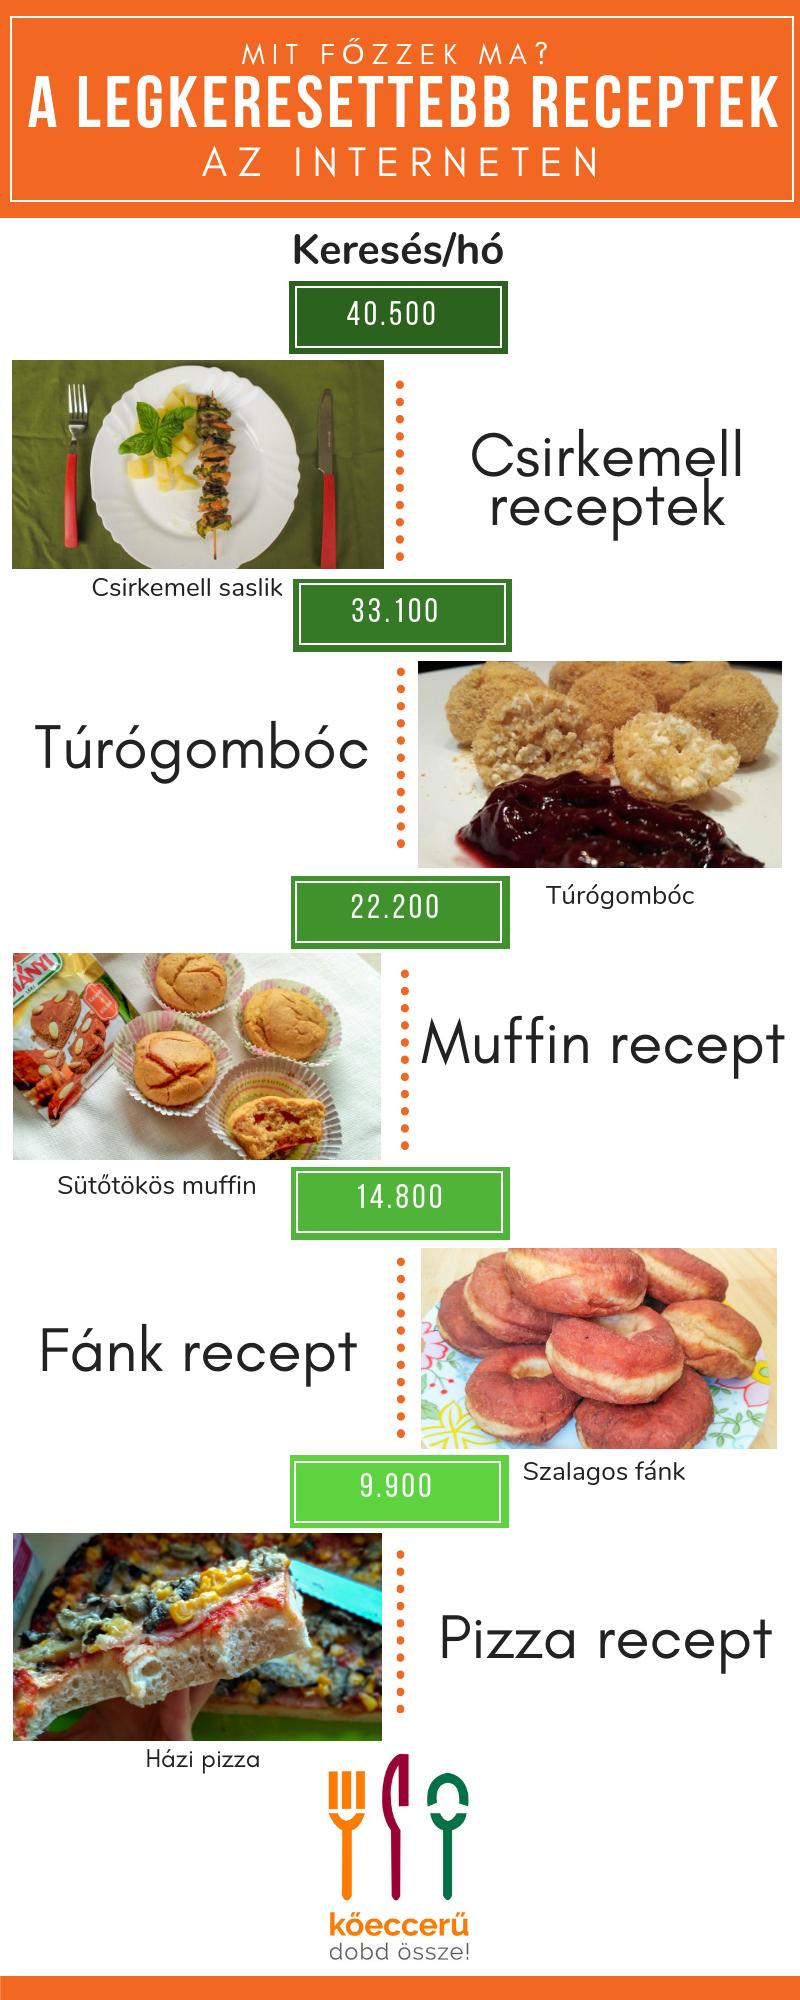 koecceru.hu - legkeresettebb receptek infografikája